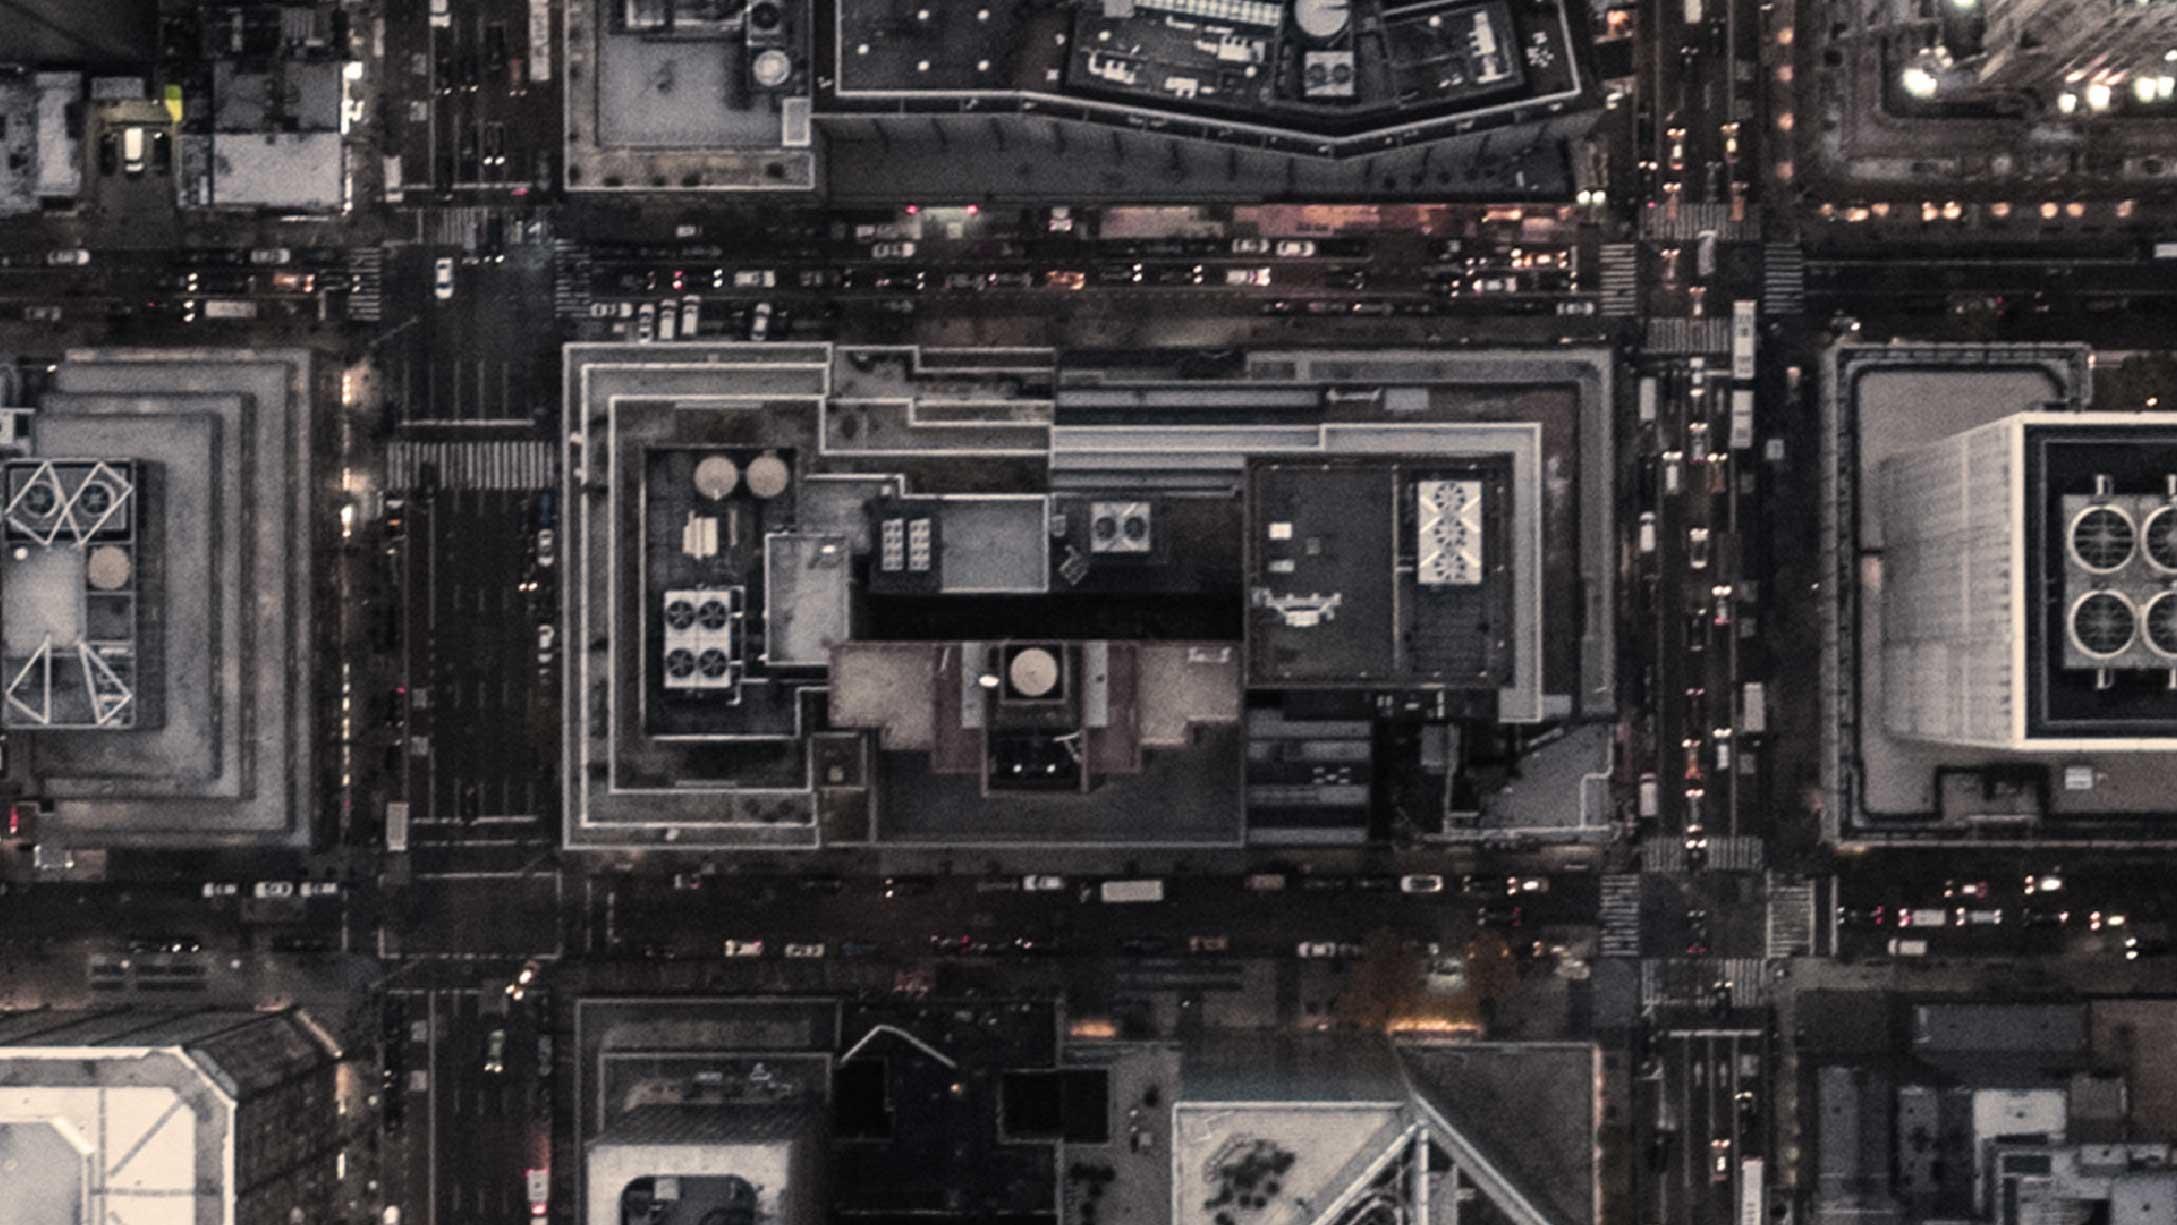 Birds eye view of a city